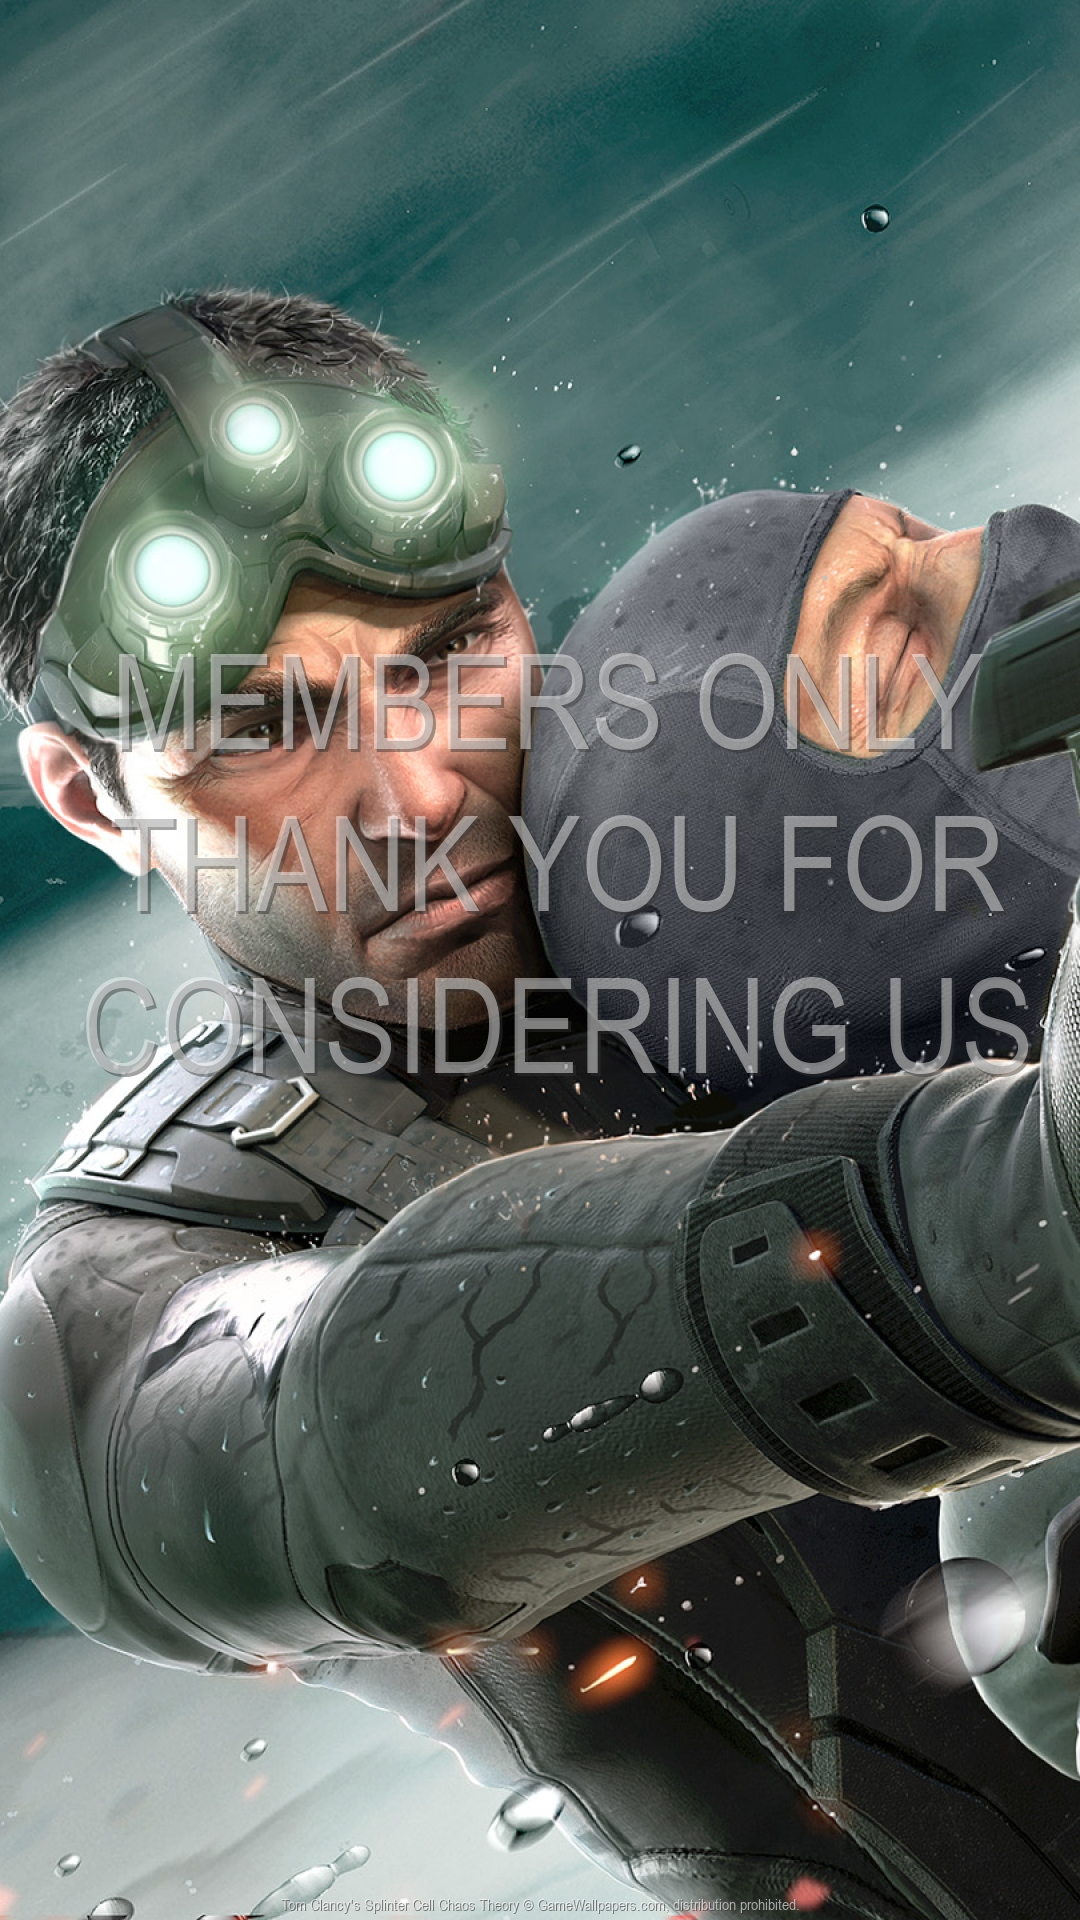 Tom Clancy S Splinter Cell Chaos Theory Wallpaper 01 1920x1080